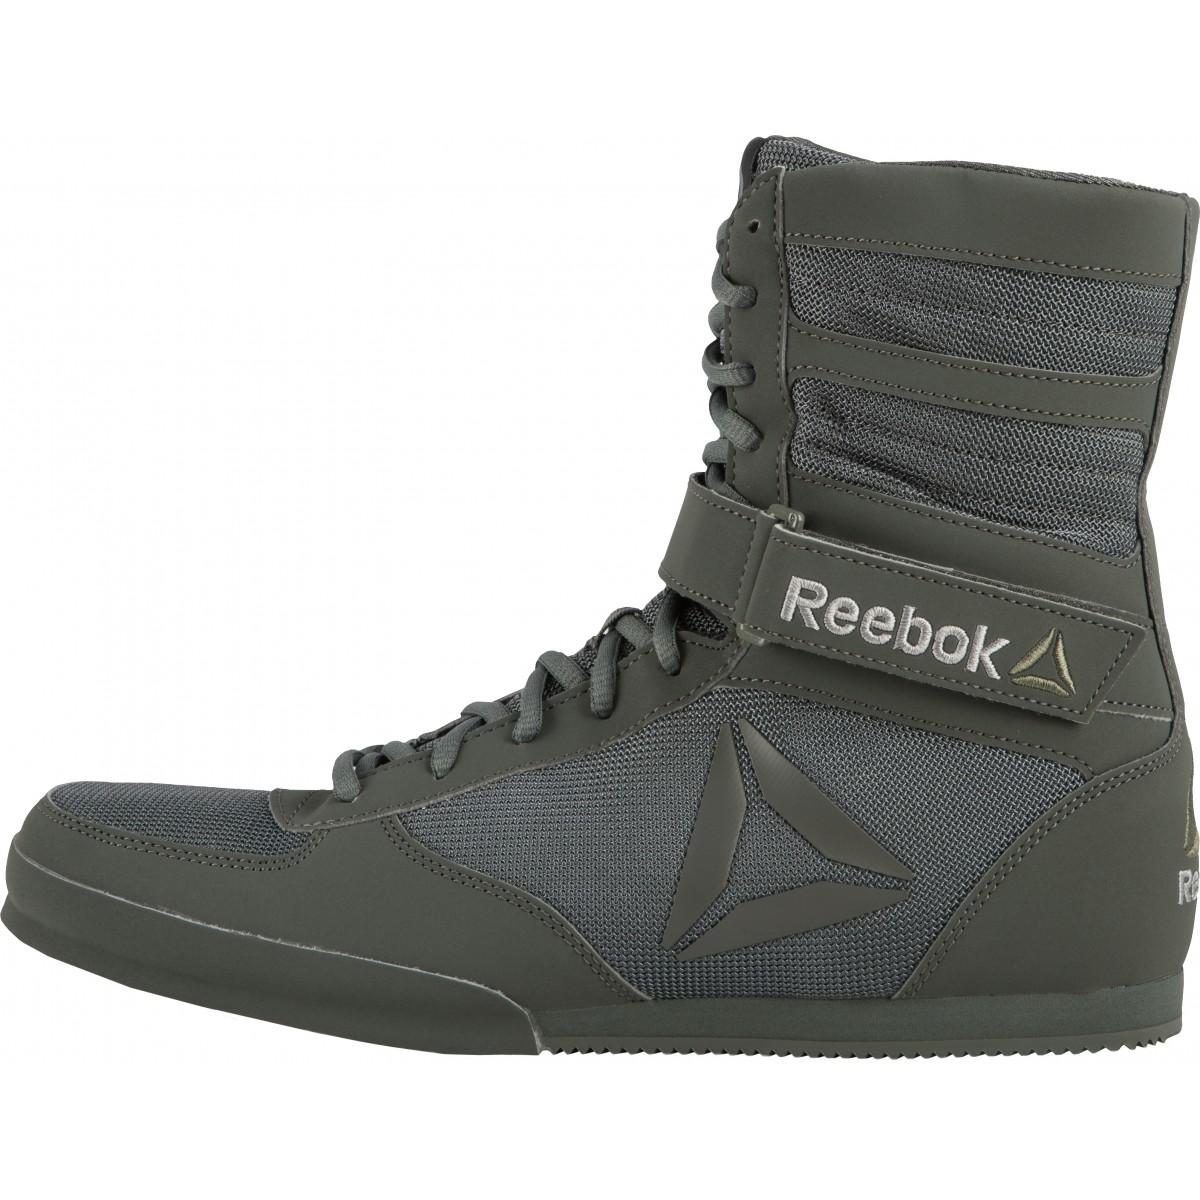 43666c3be447 Women s Reebok Renegade Pro Boxing Boots - Grey